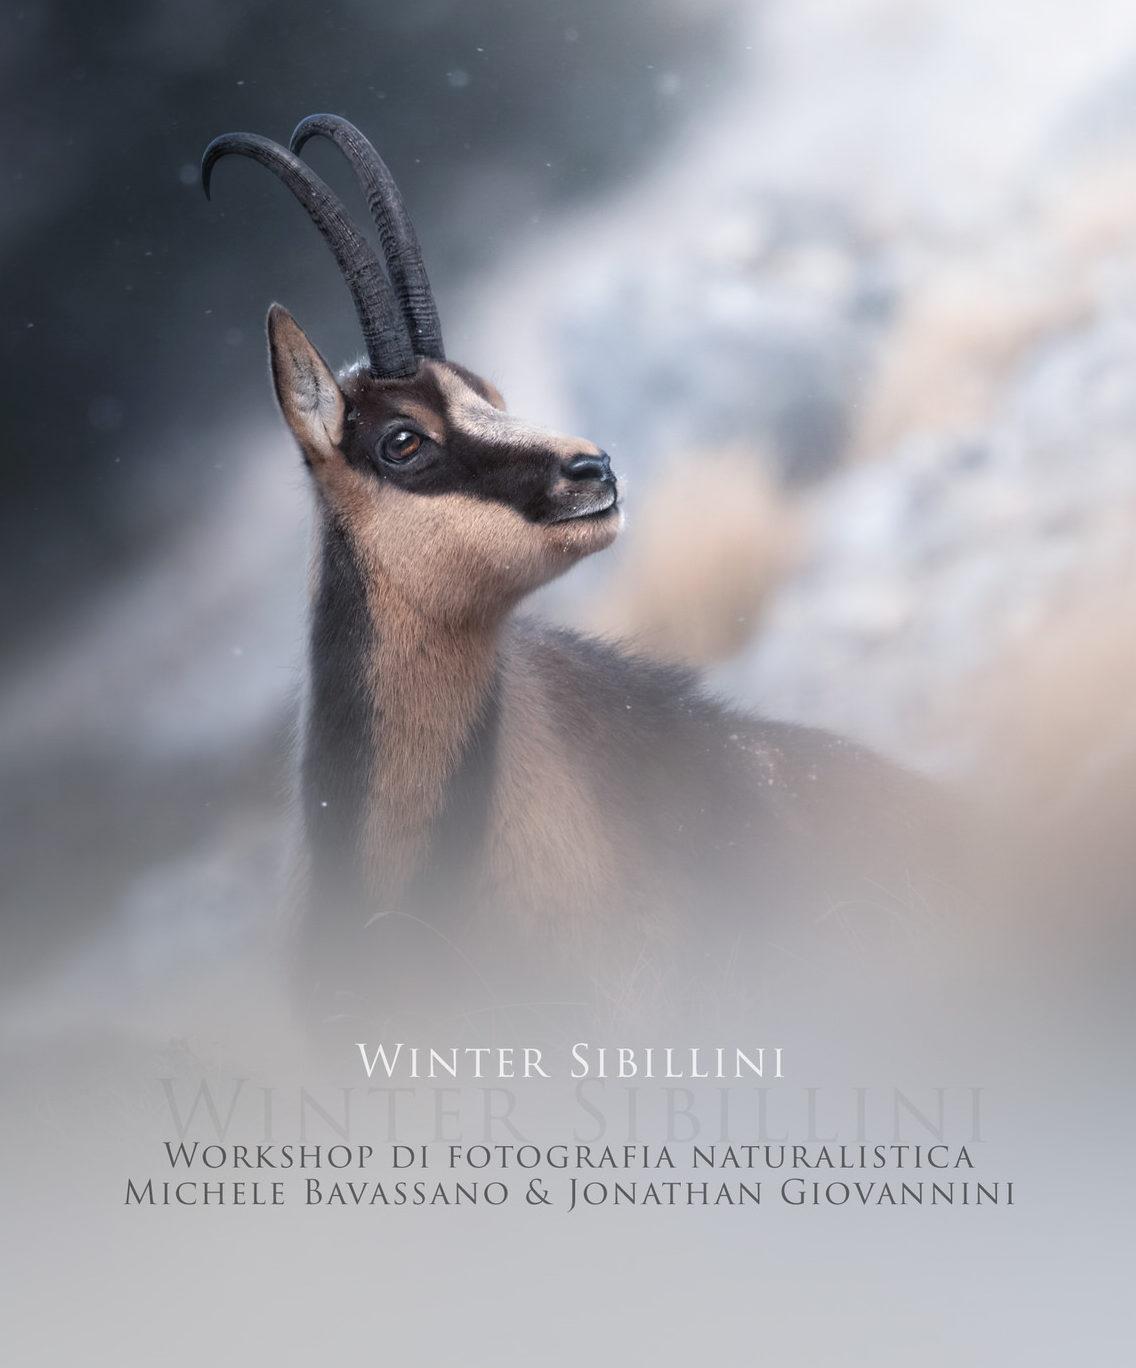 Winter-Sibillini-workshop di fotografia naturalistica